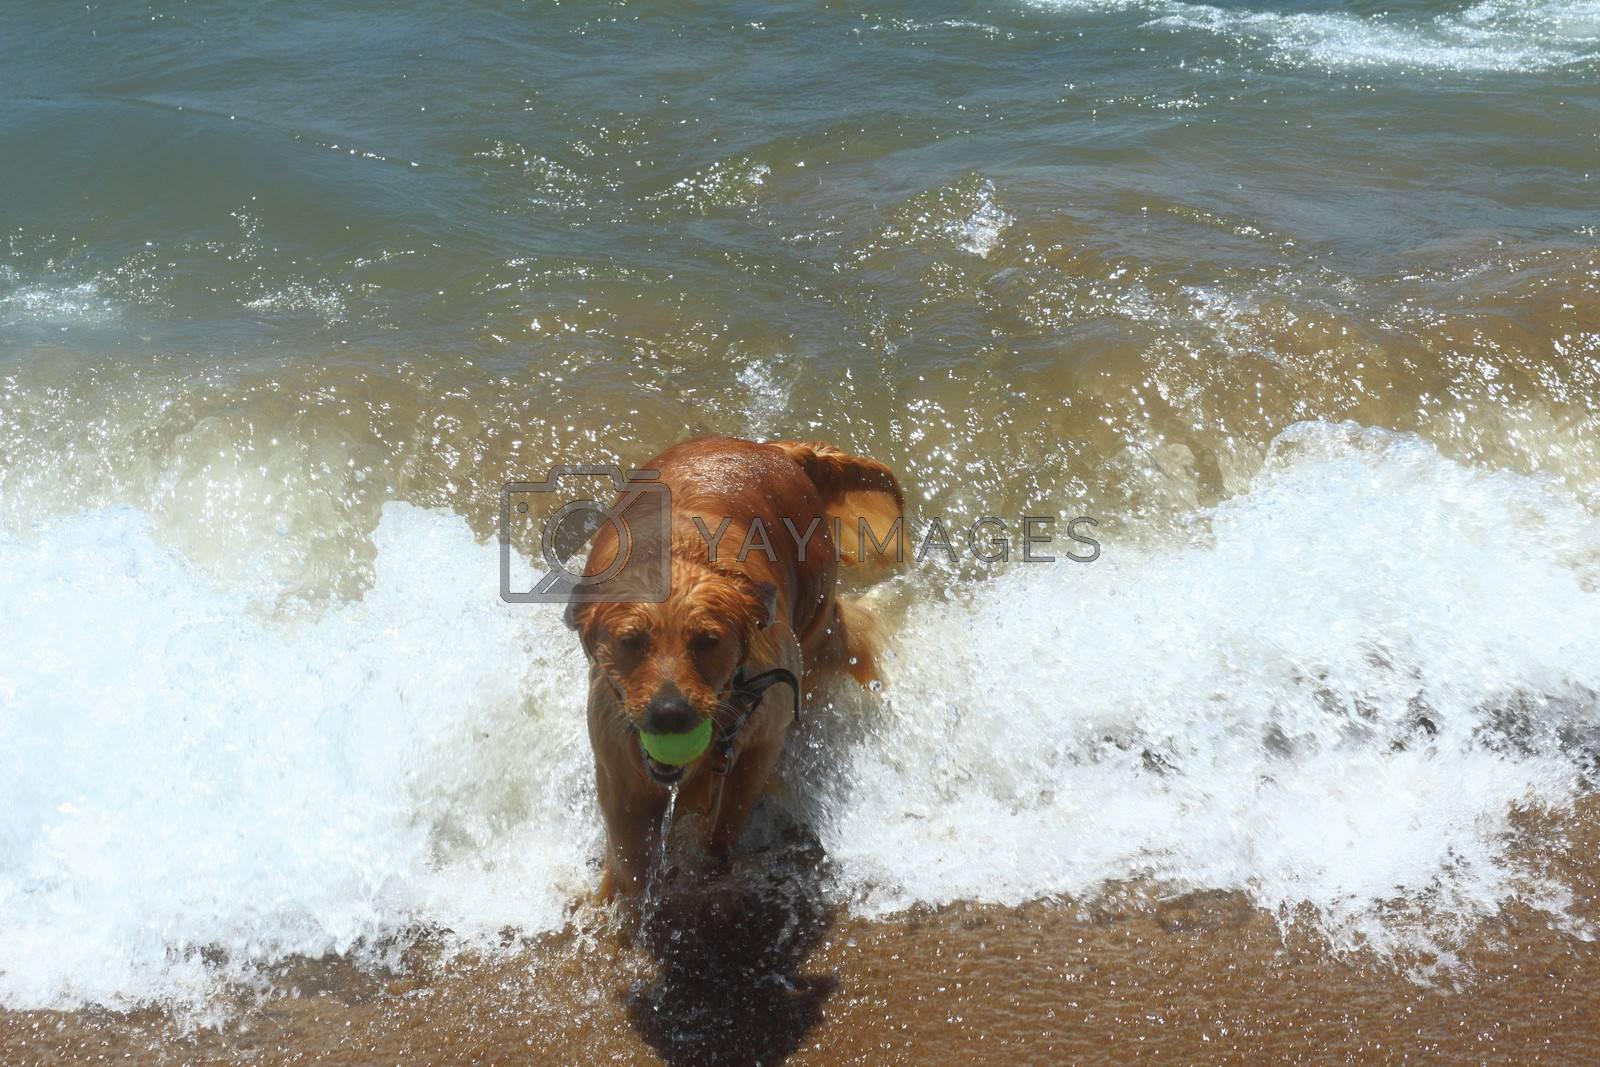 Beautiful pedigree dog on the beach plays in the coastal strip of water.